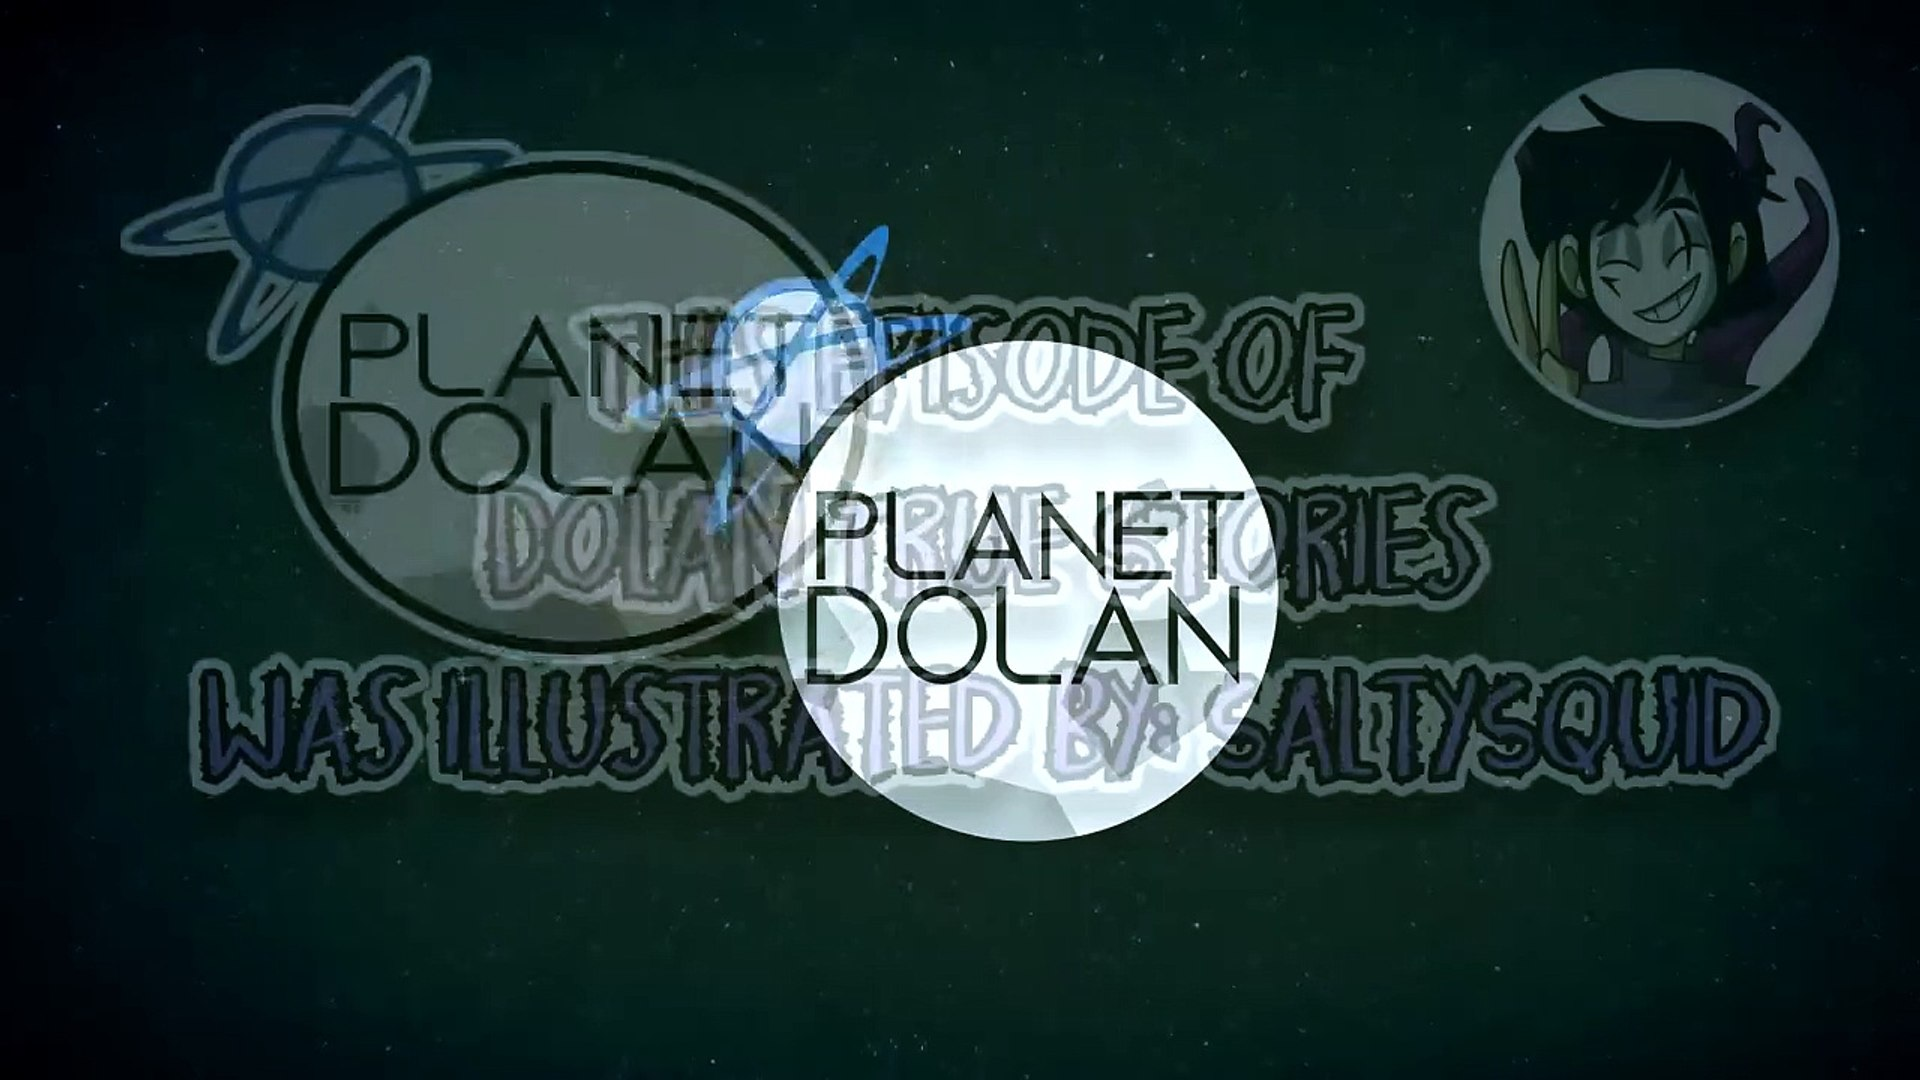 OUR WORST NIGHTMARES _ Dolan True Stories-1OJ0aZ8M